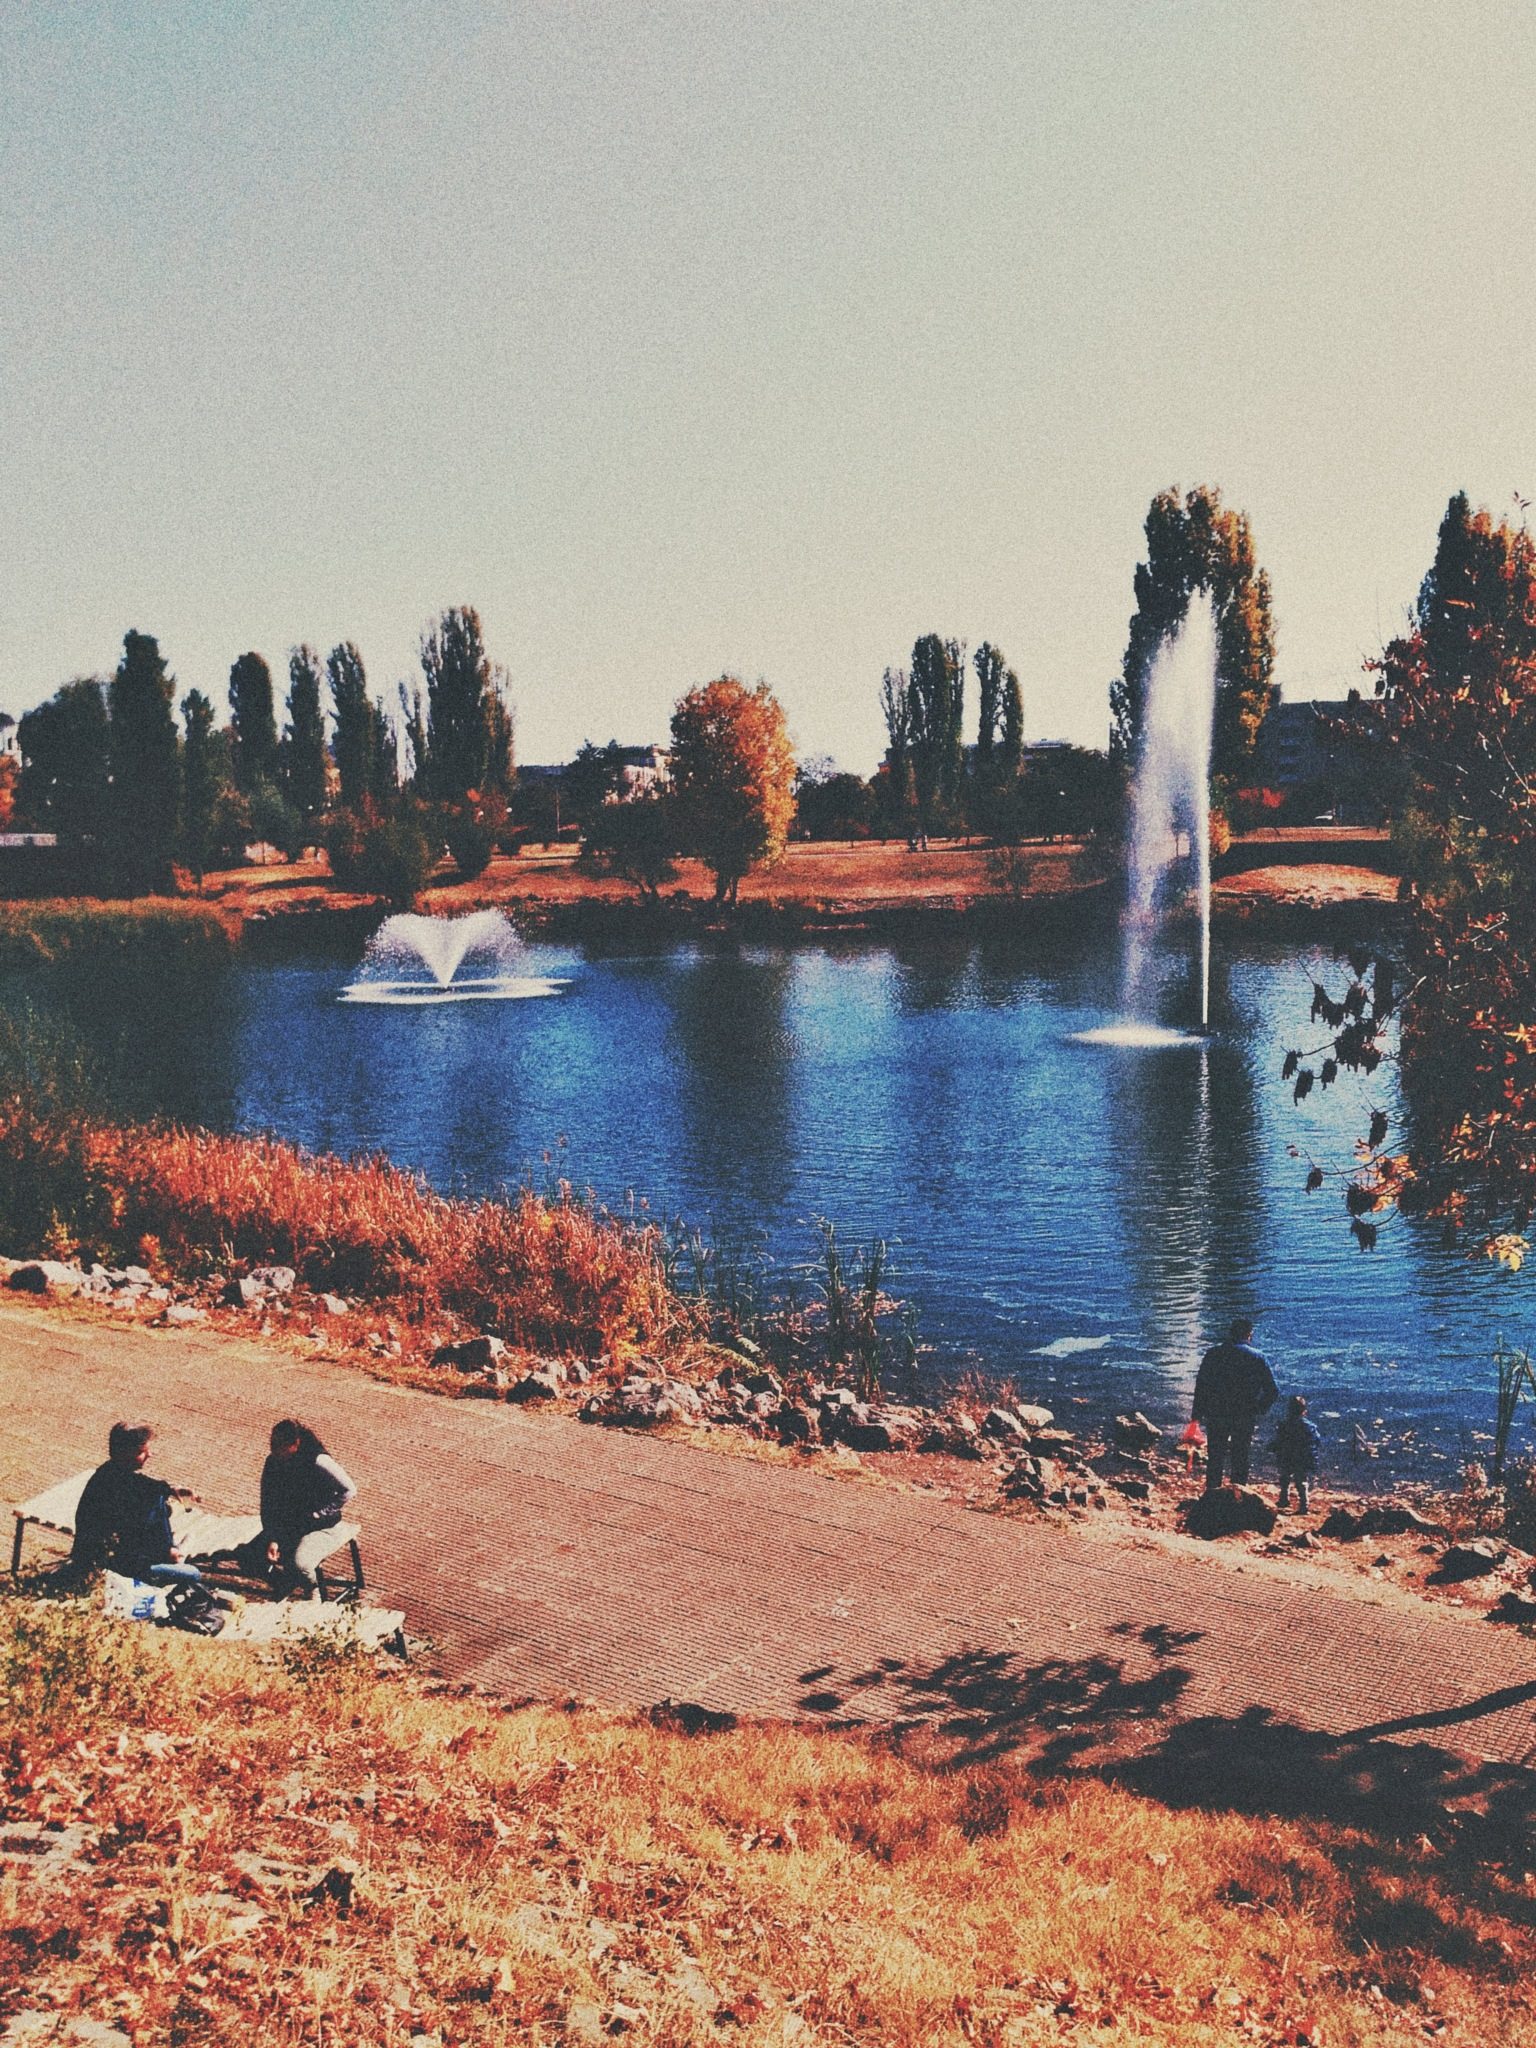 Autumn in the Near Neighbourhood 26 by Yaroslav Boshnakov